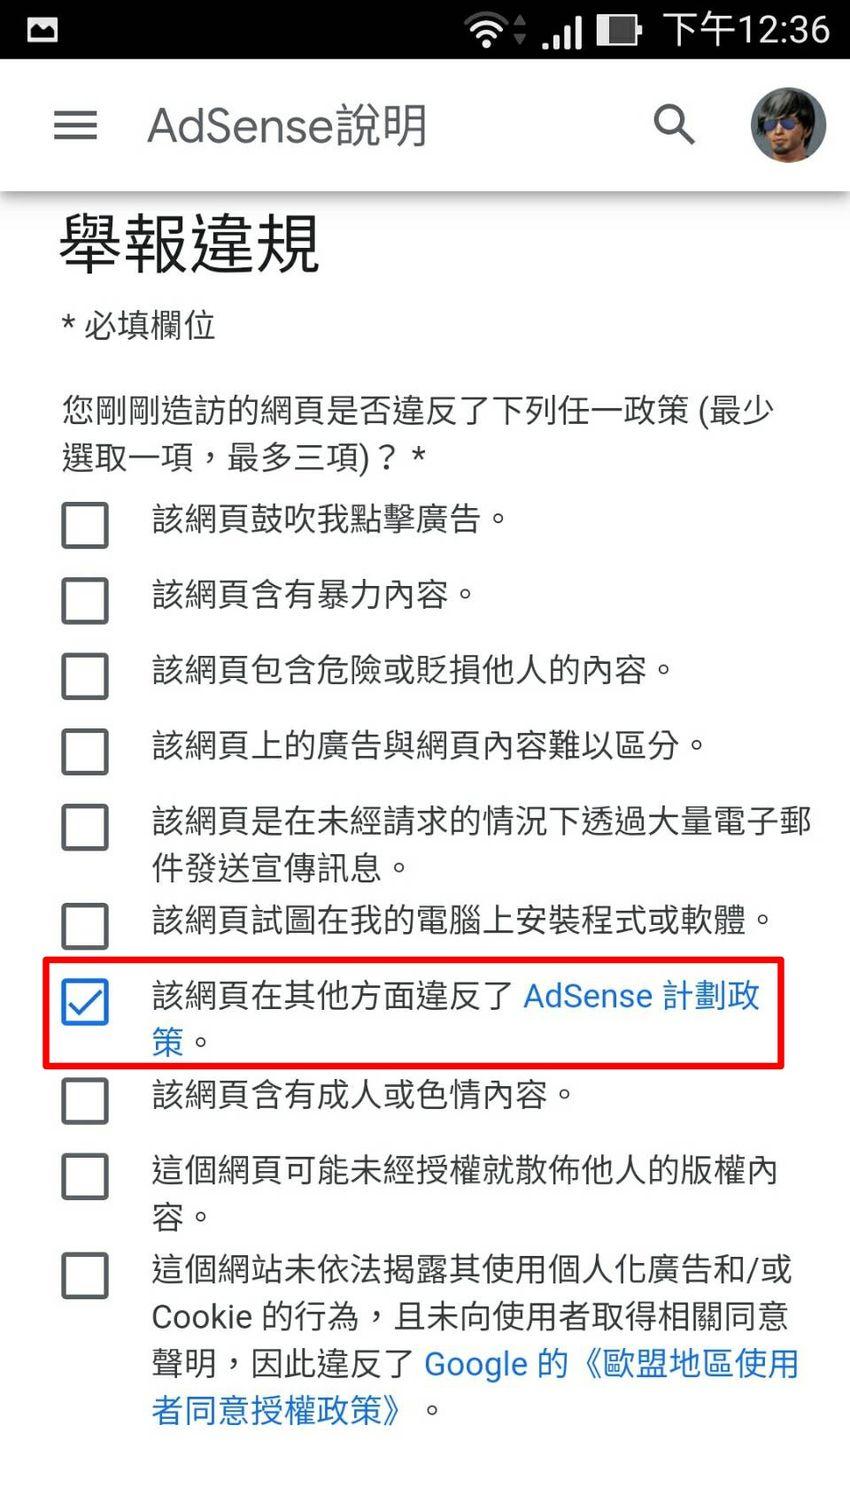 app-plagiarism-prosecute-12.jpg-檢舉侵權抄襲的 APP 使其下架(連同 Adsense)流程實錄